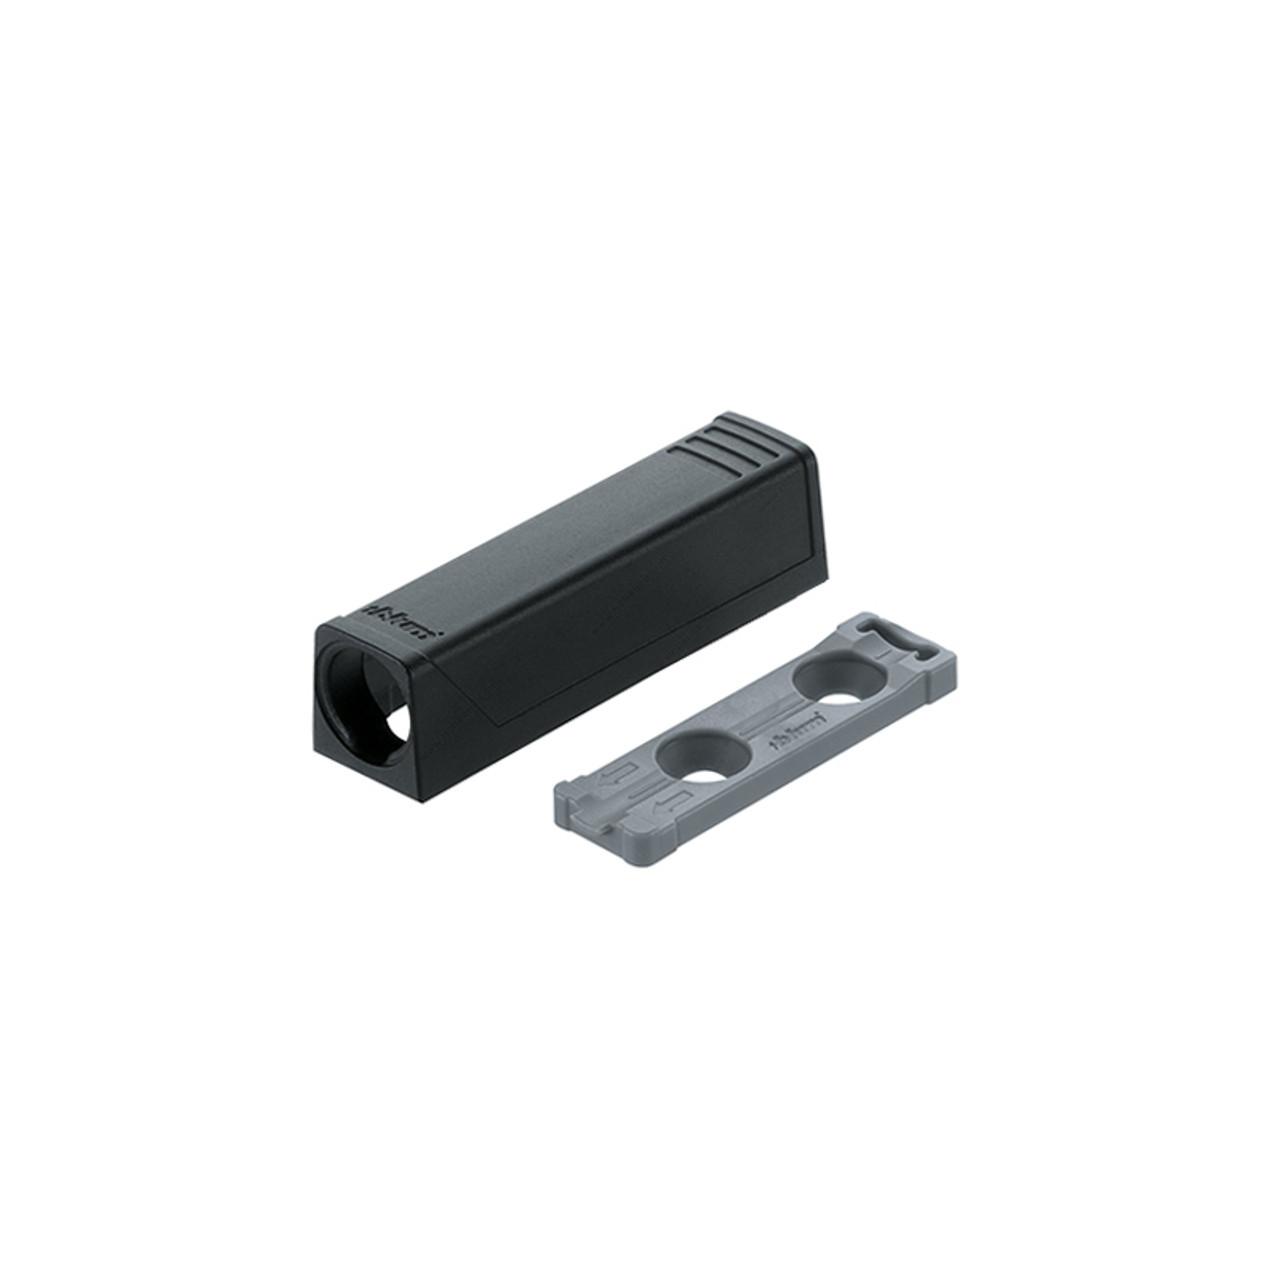 TIP-ON for Doors Short Inline Adapter Plate - Black